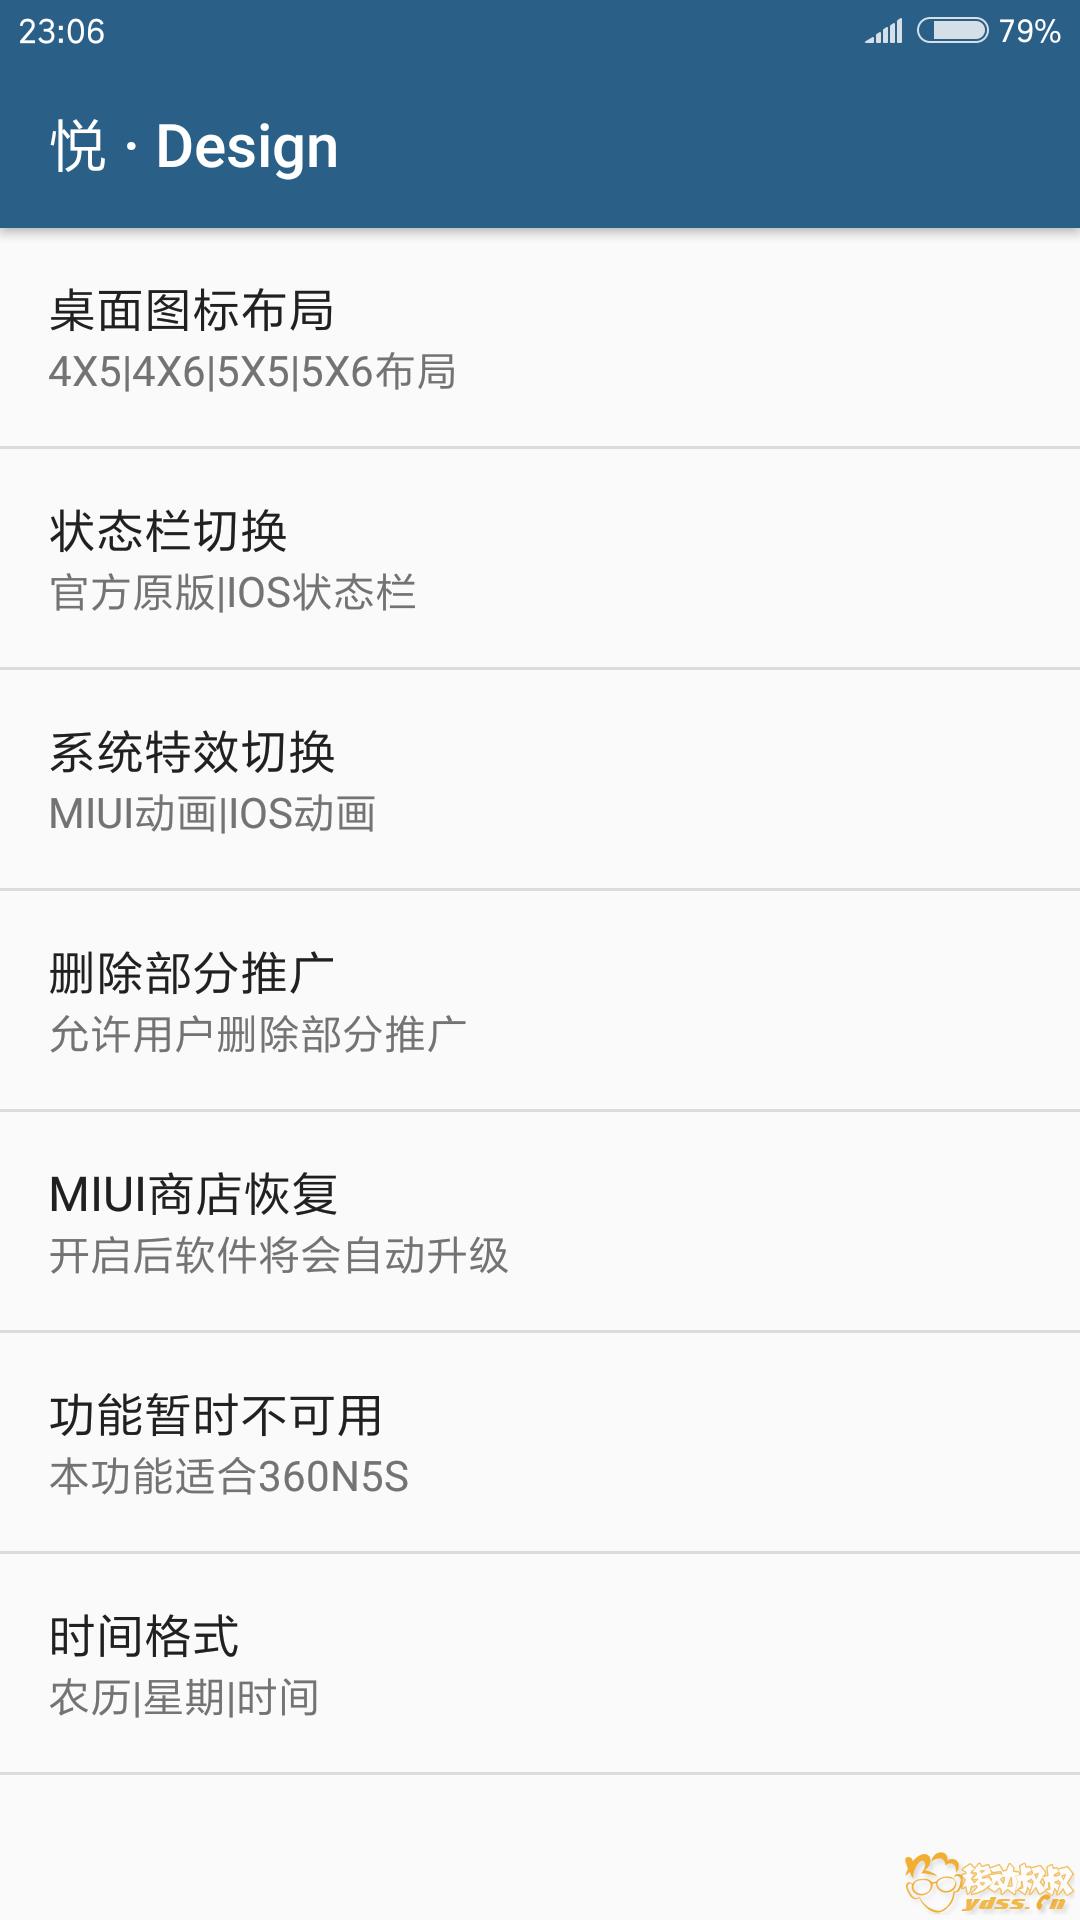 Screenshot_2017-12-16-23-06-11-785_com.mrxy.design.png